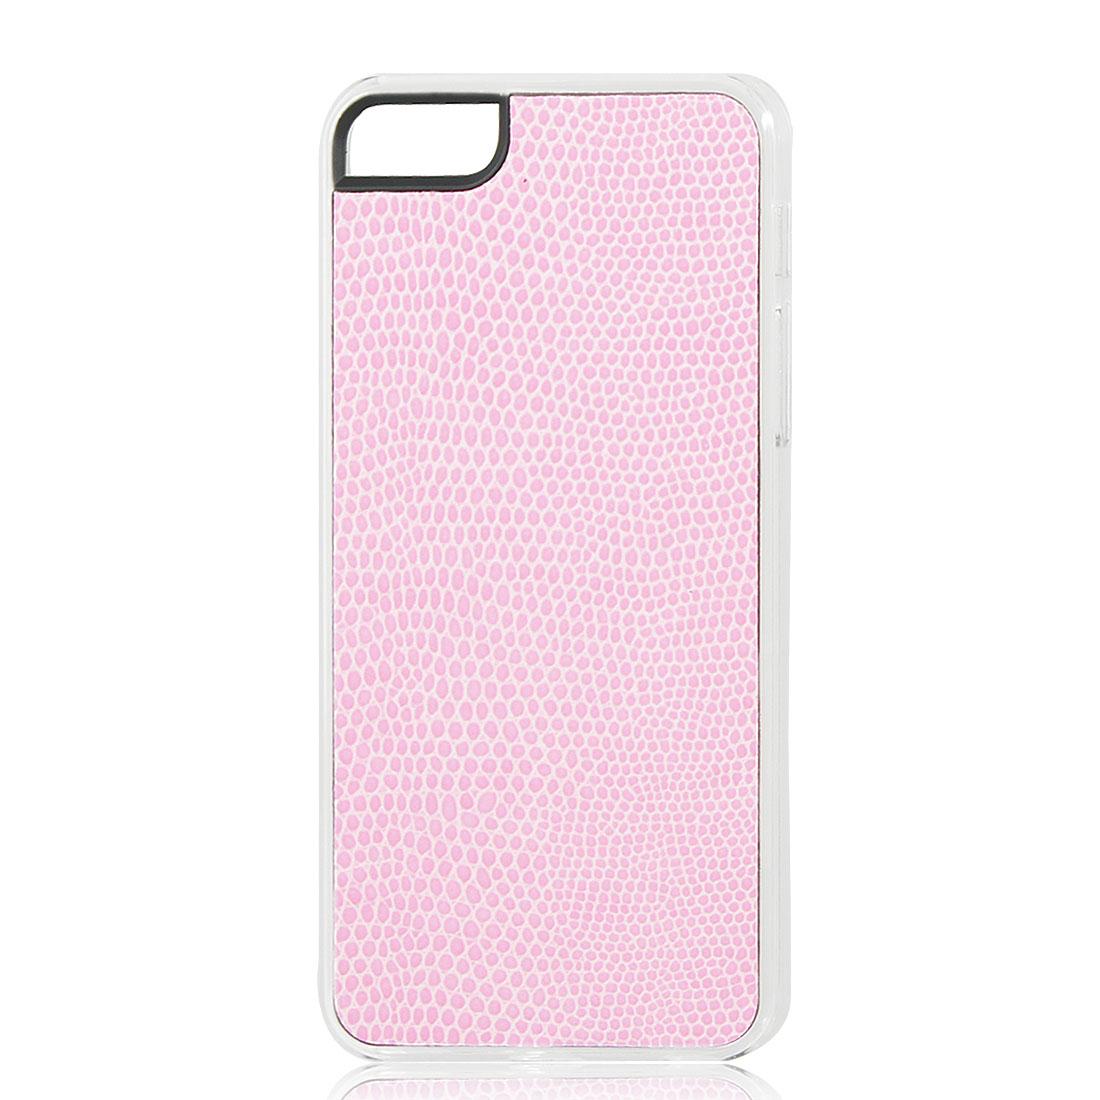 Light Pink Snake Pattern Hard Back Case Cover Skin for iPhone 5 5G